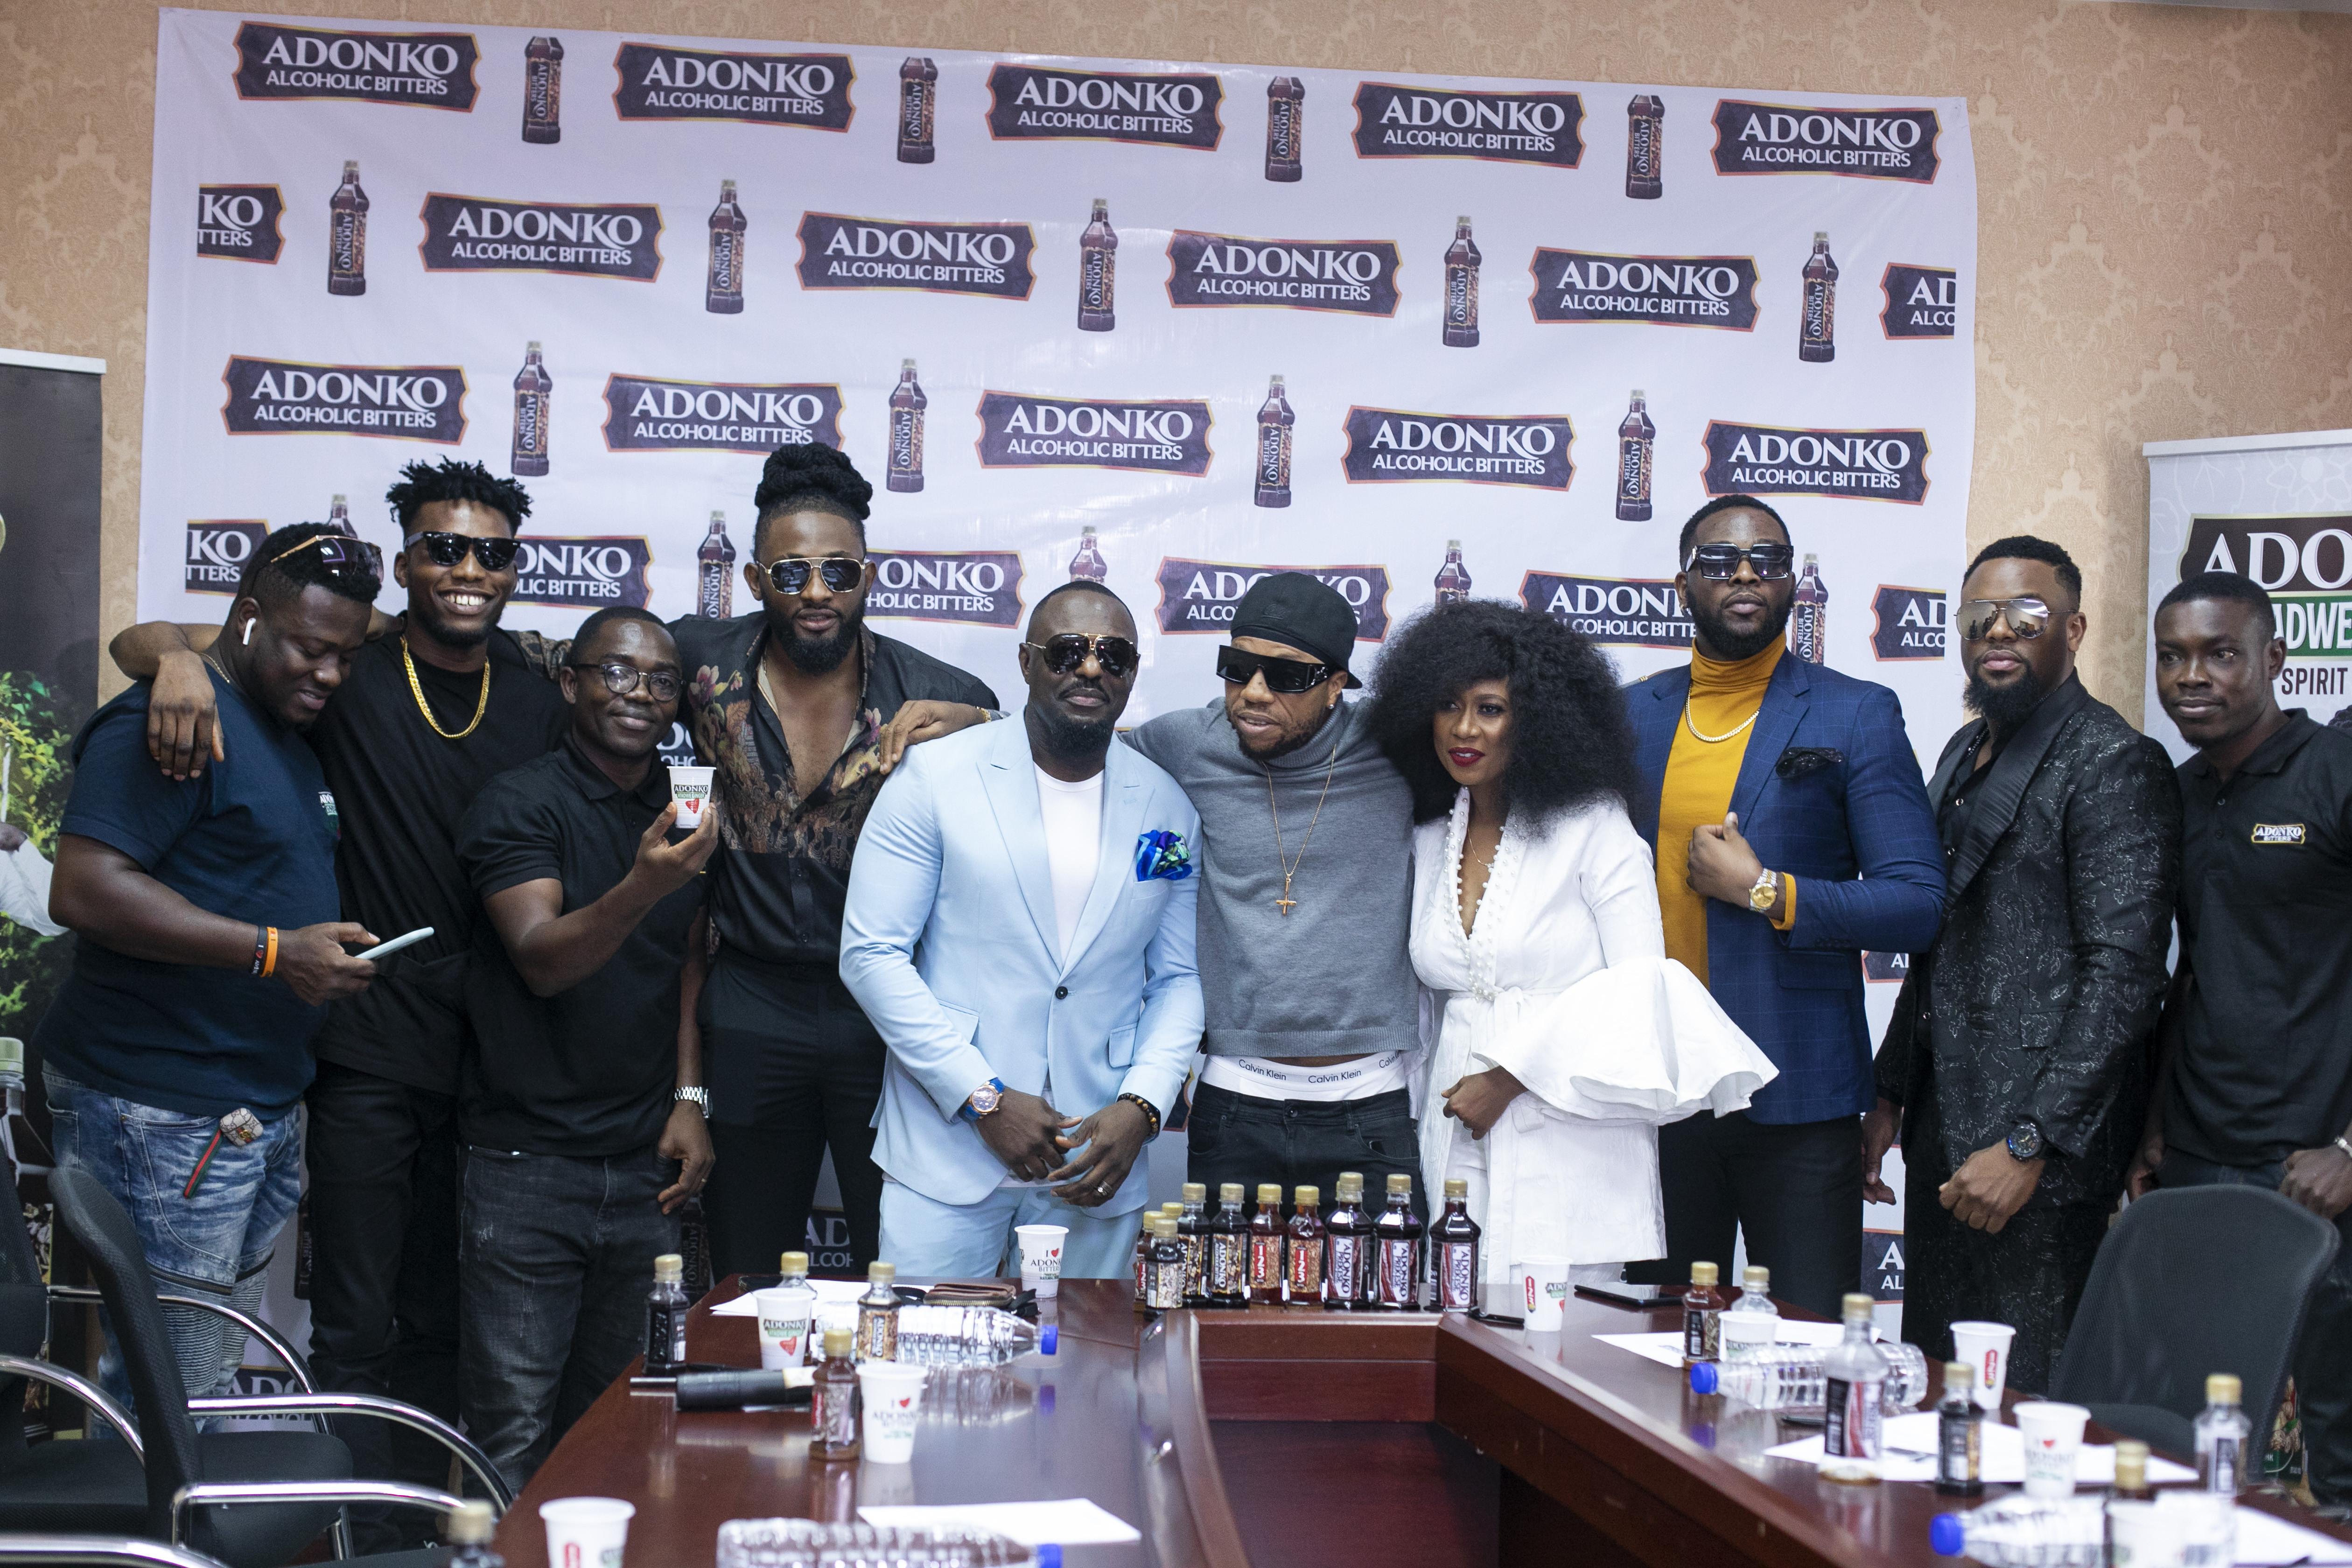 Adonko Bitters unveils Brand Ambassadors; names Jim Iyke, Ini Edo, Uti Nwachukwu, and Charles Okocha, Melvin Oduah, Victor AD, and Teddy A